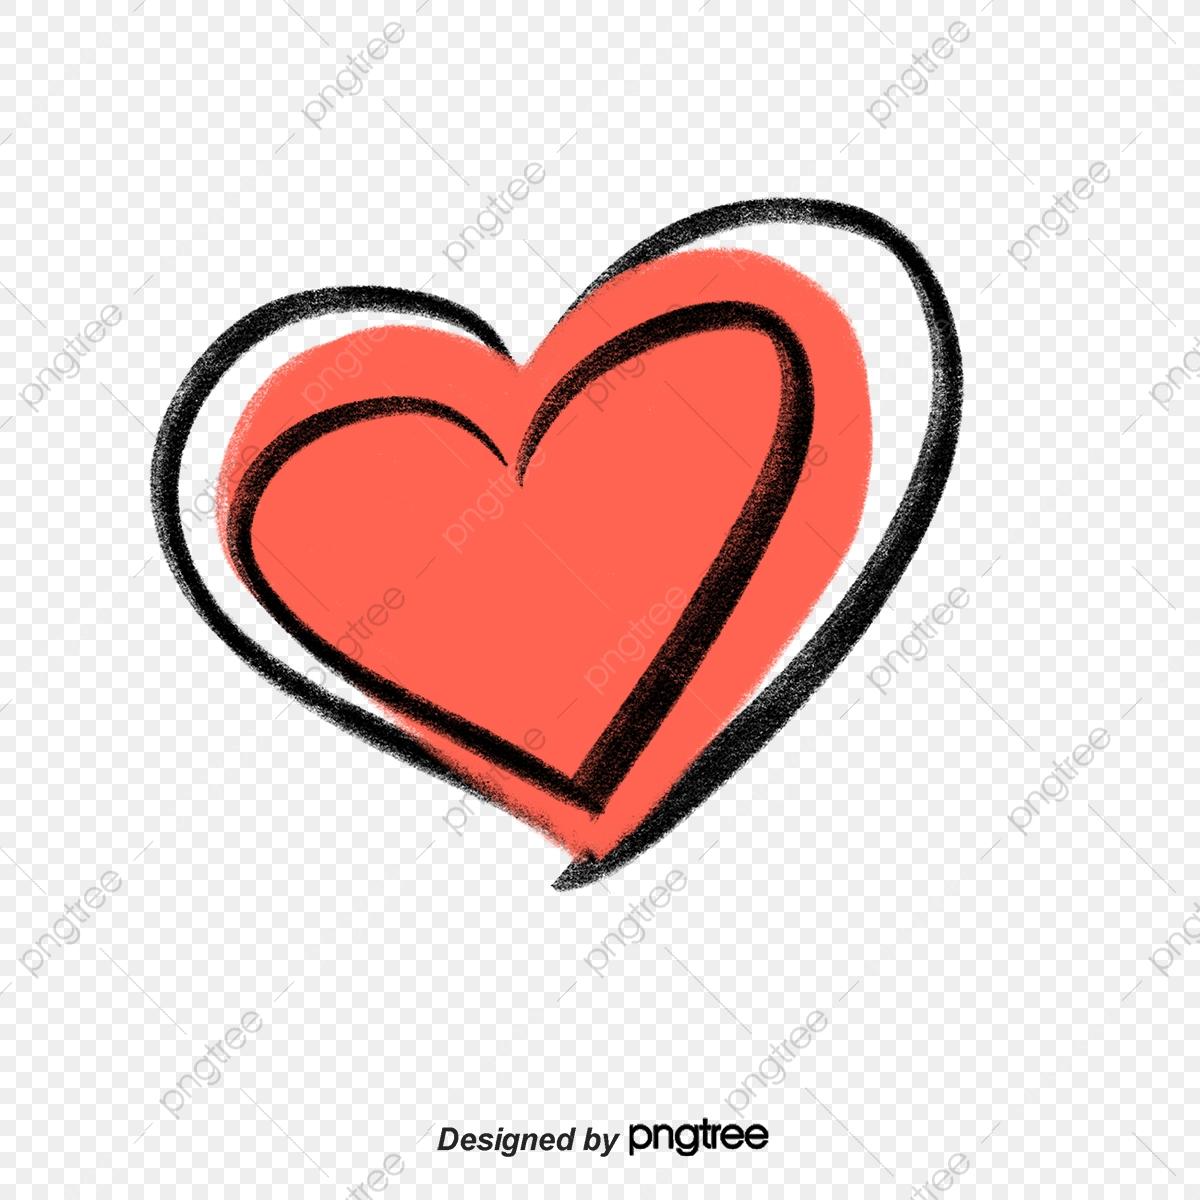 Style love element illustration. Graffiti clipart heart